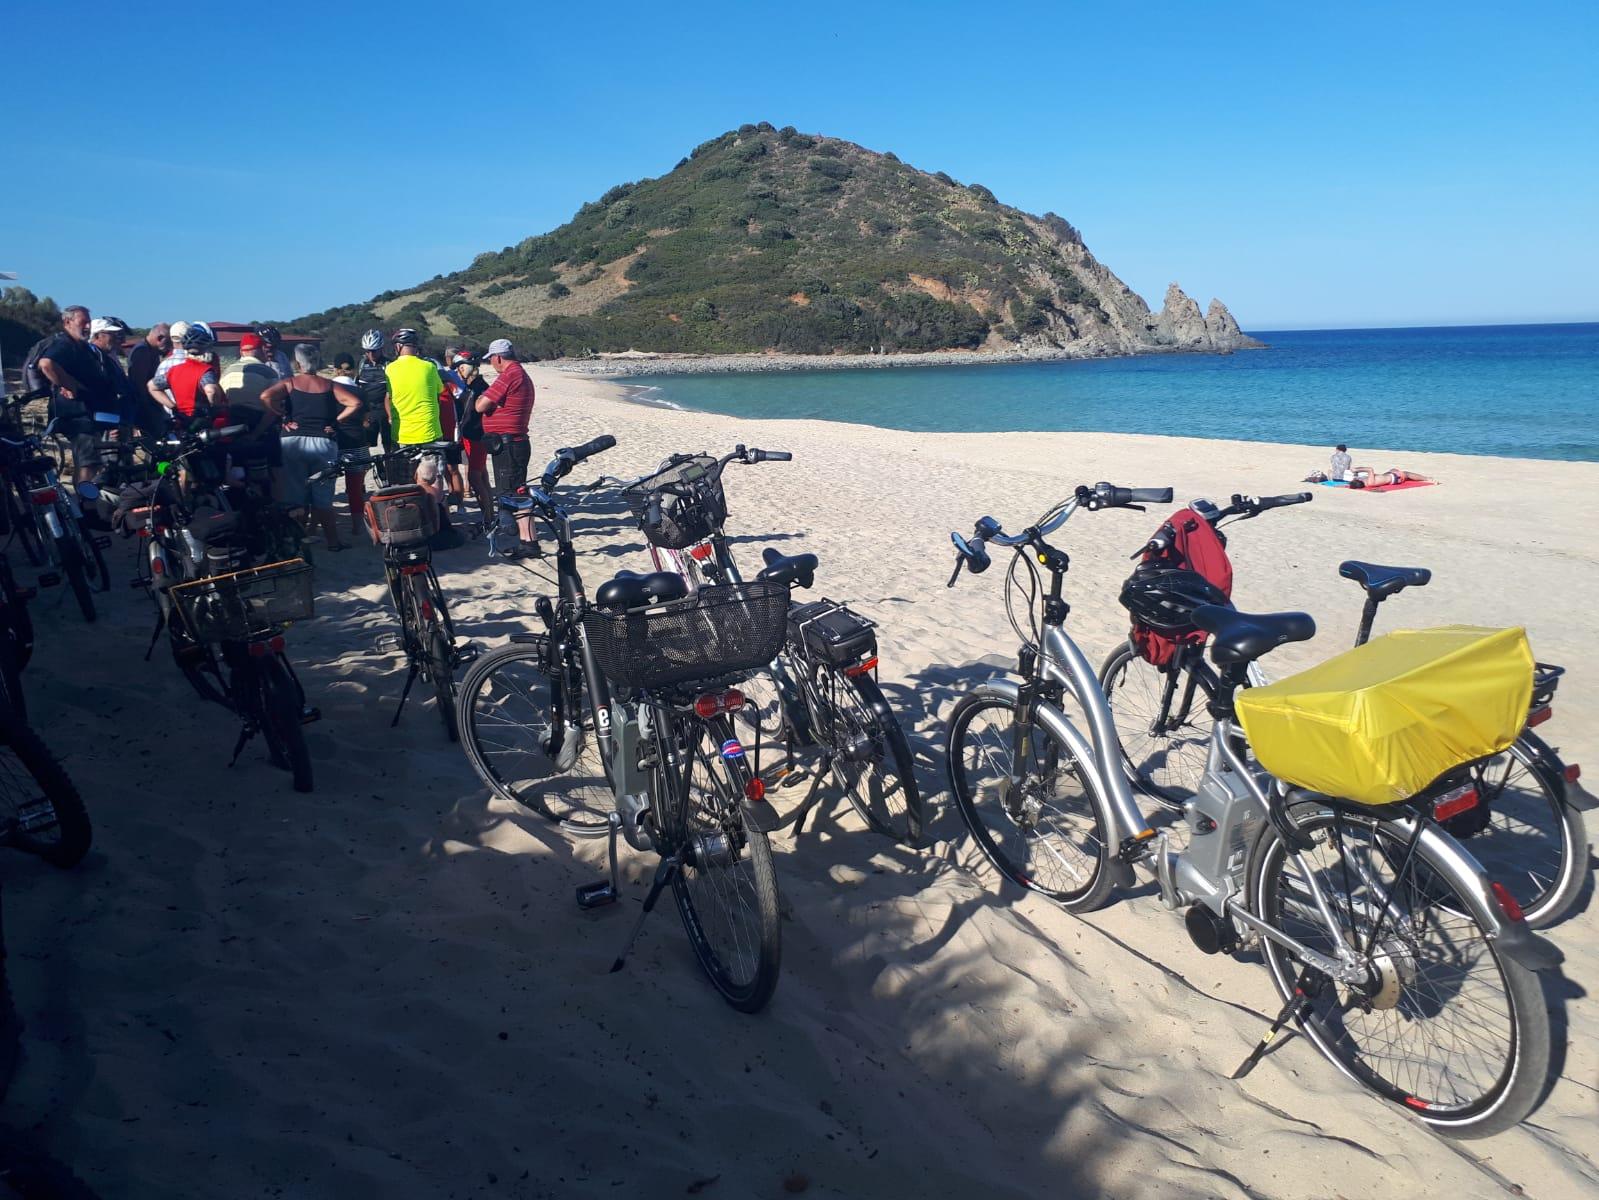 Settimane Sarde al Camping Capo Ferrato in Sardegna gita in bici